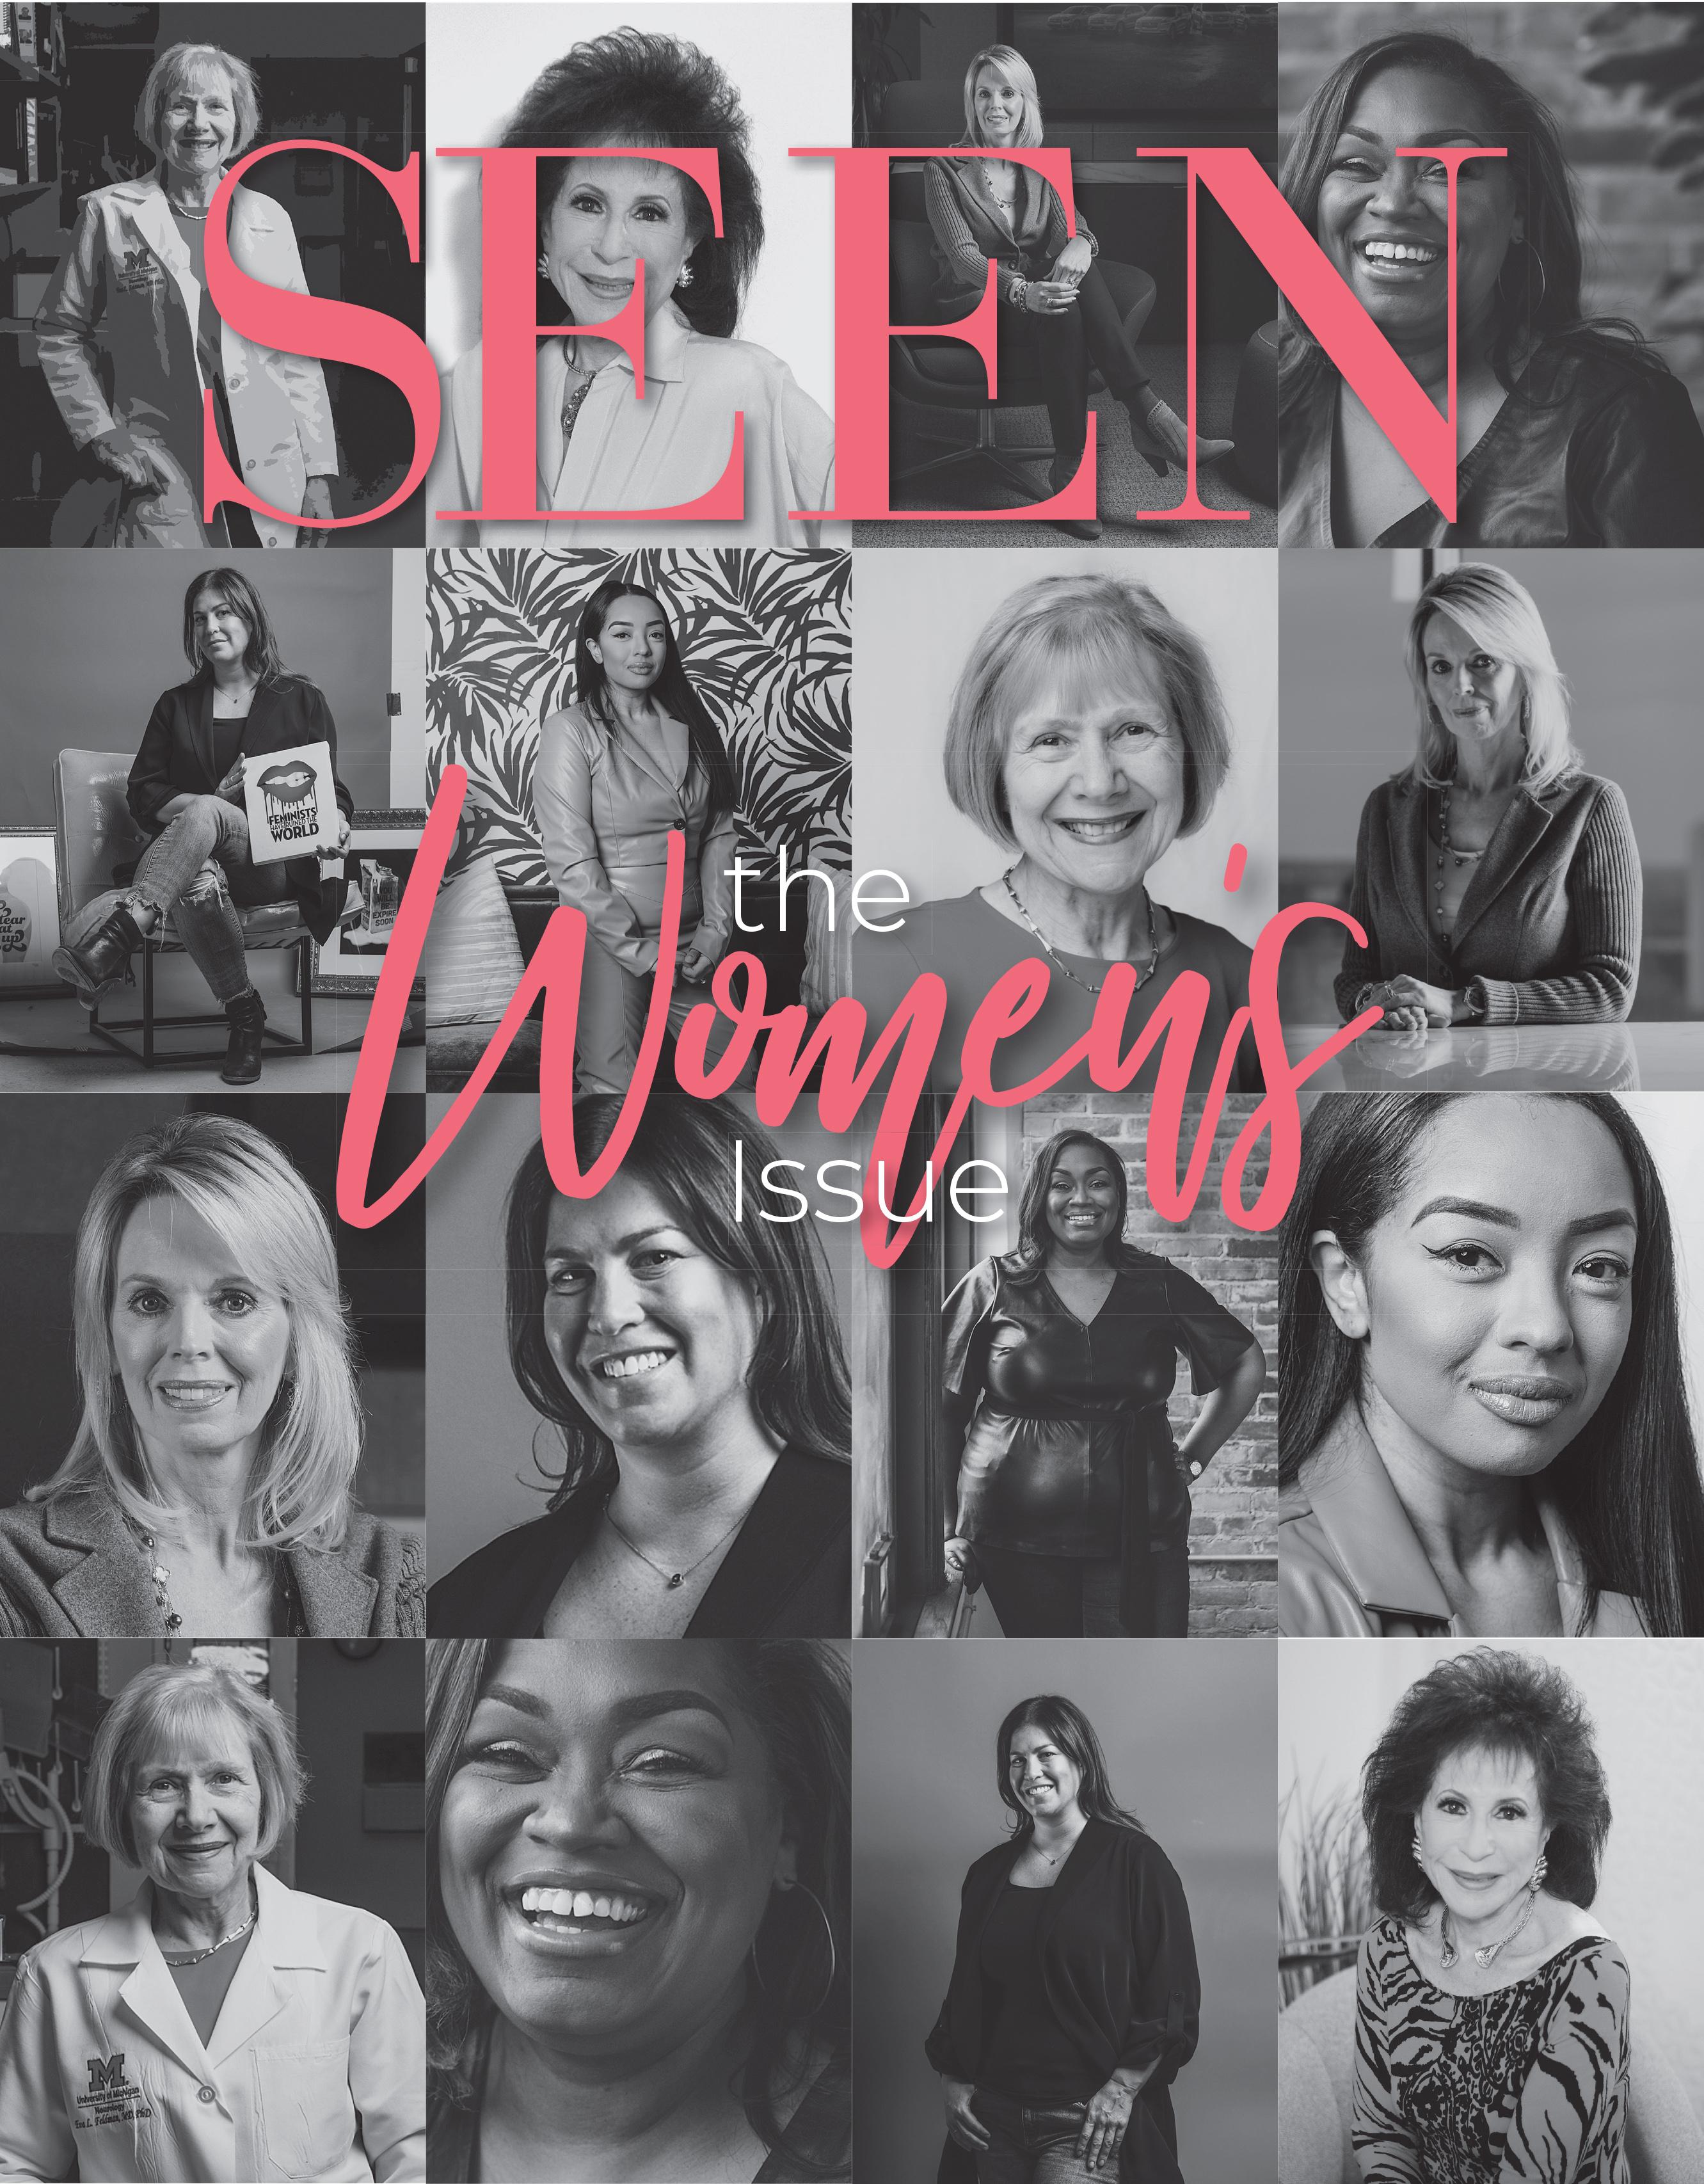 SEEN Magazine Cover featuring Dr. Eva Feldman